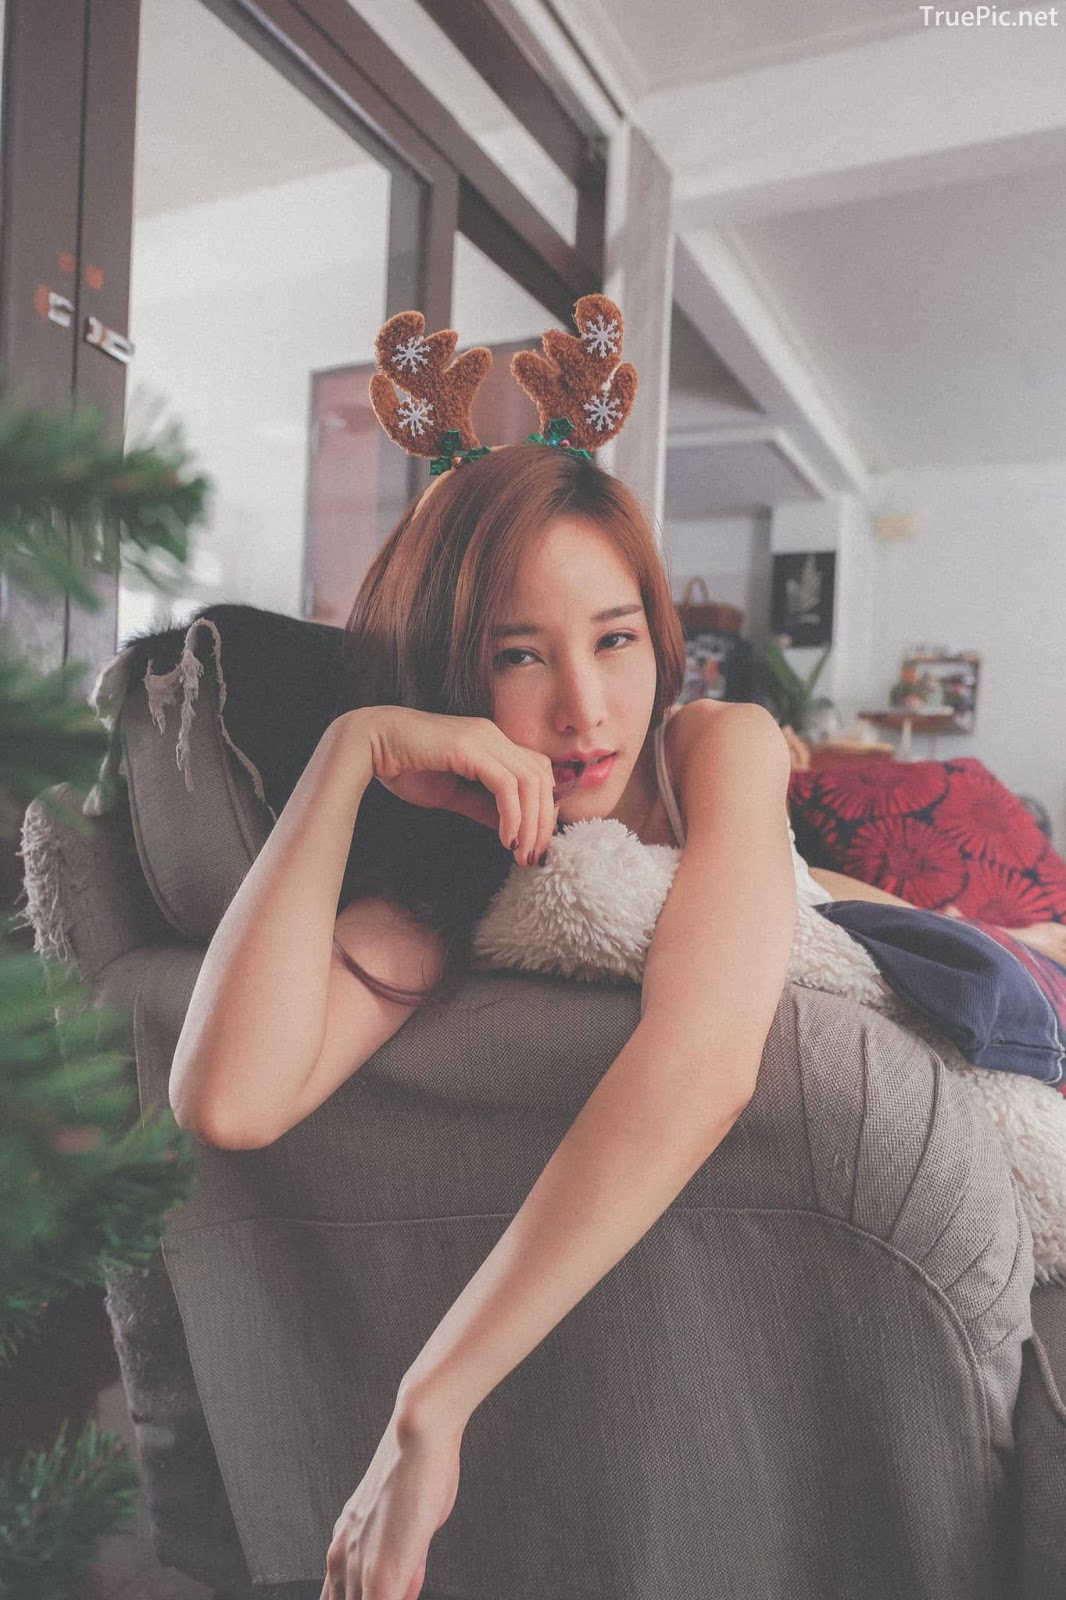 Thailand sexy model Arys Nam-in (Arysiacara) – Sexy santy girl - Picture 2